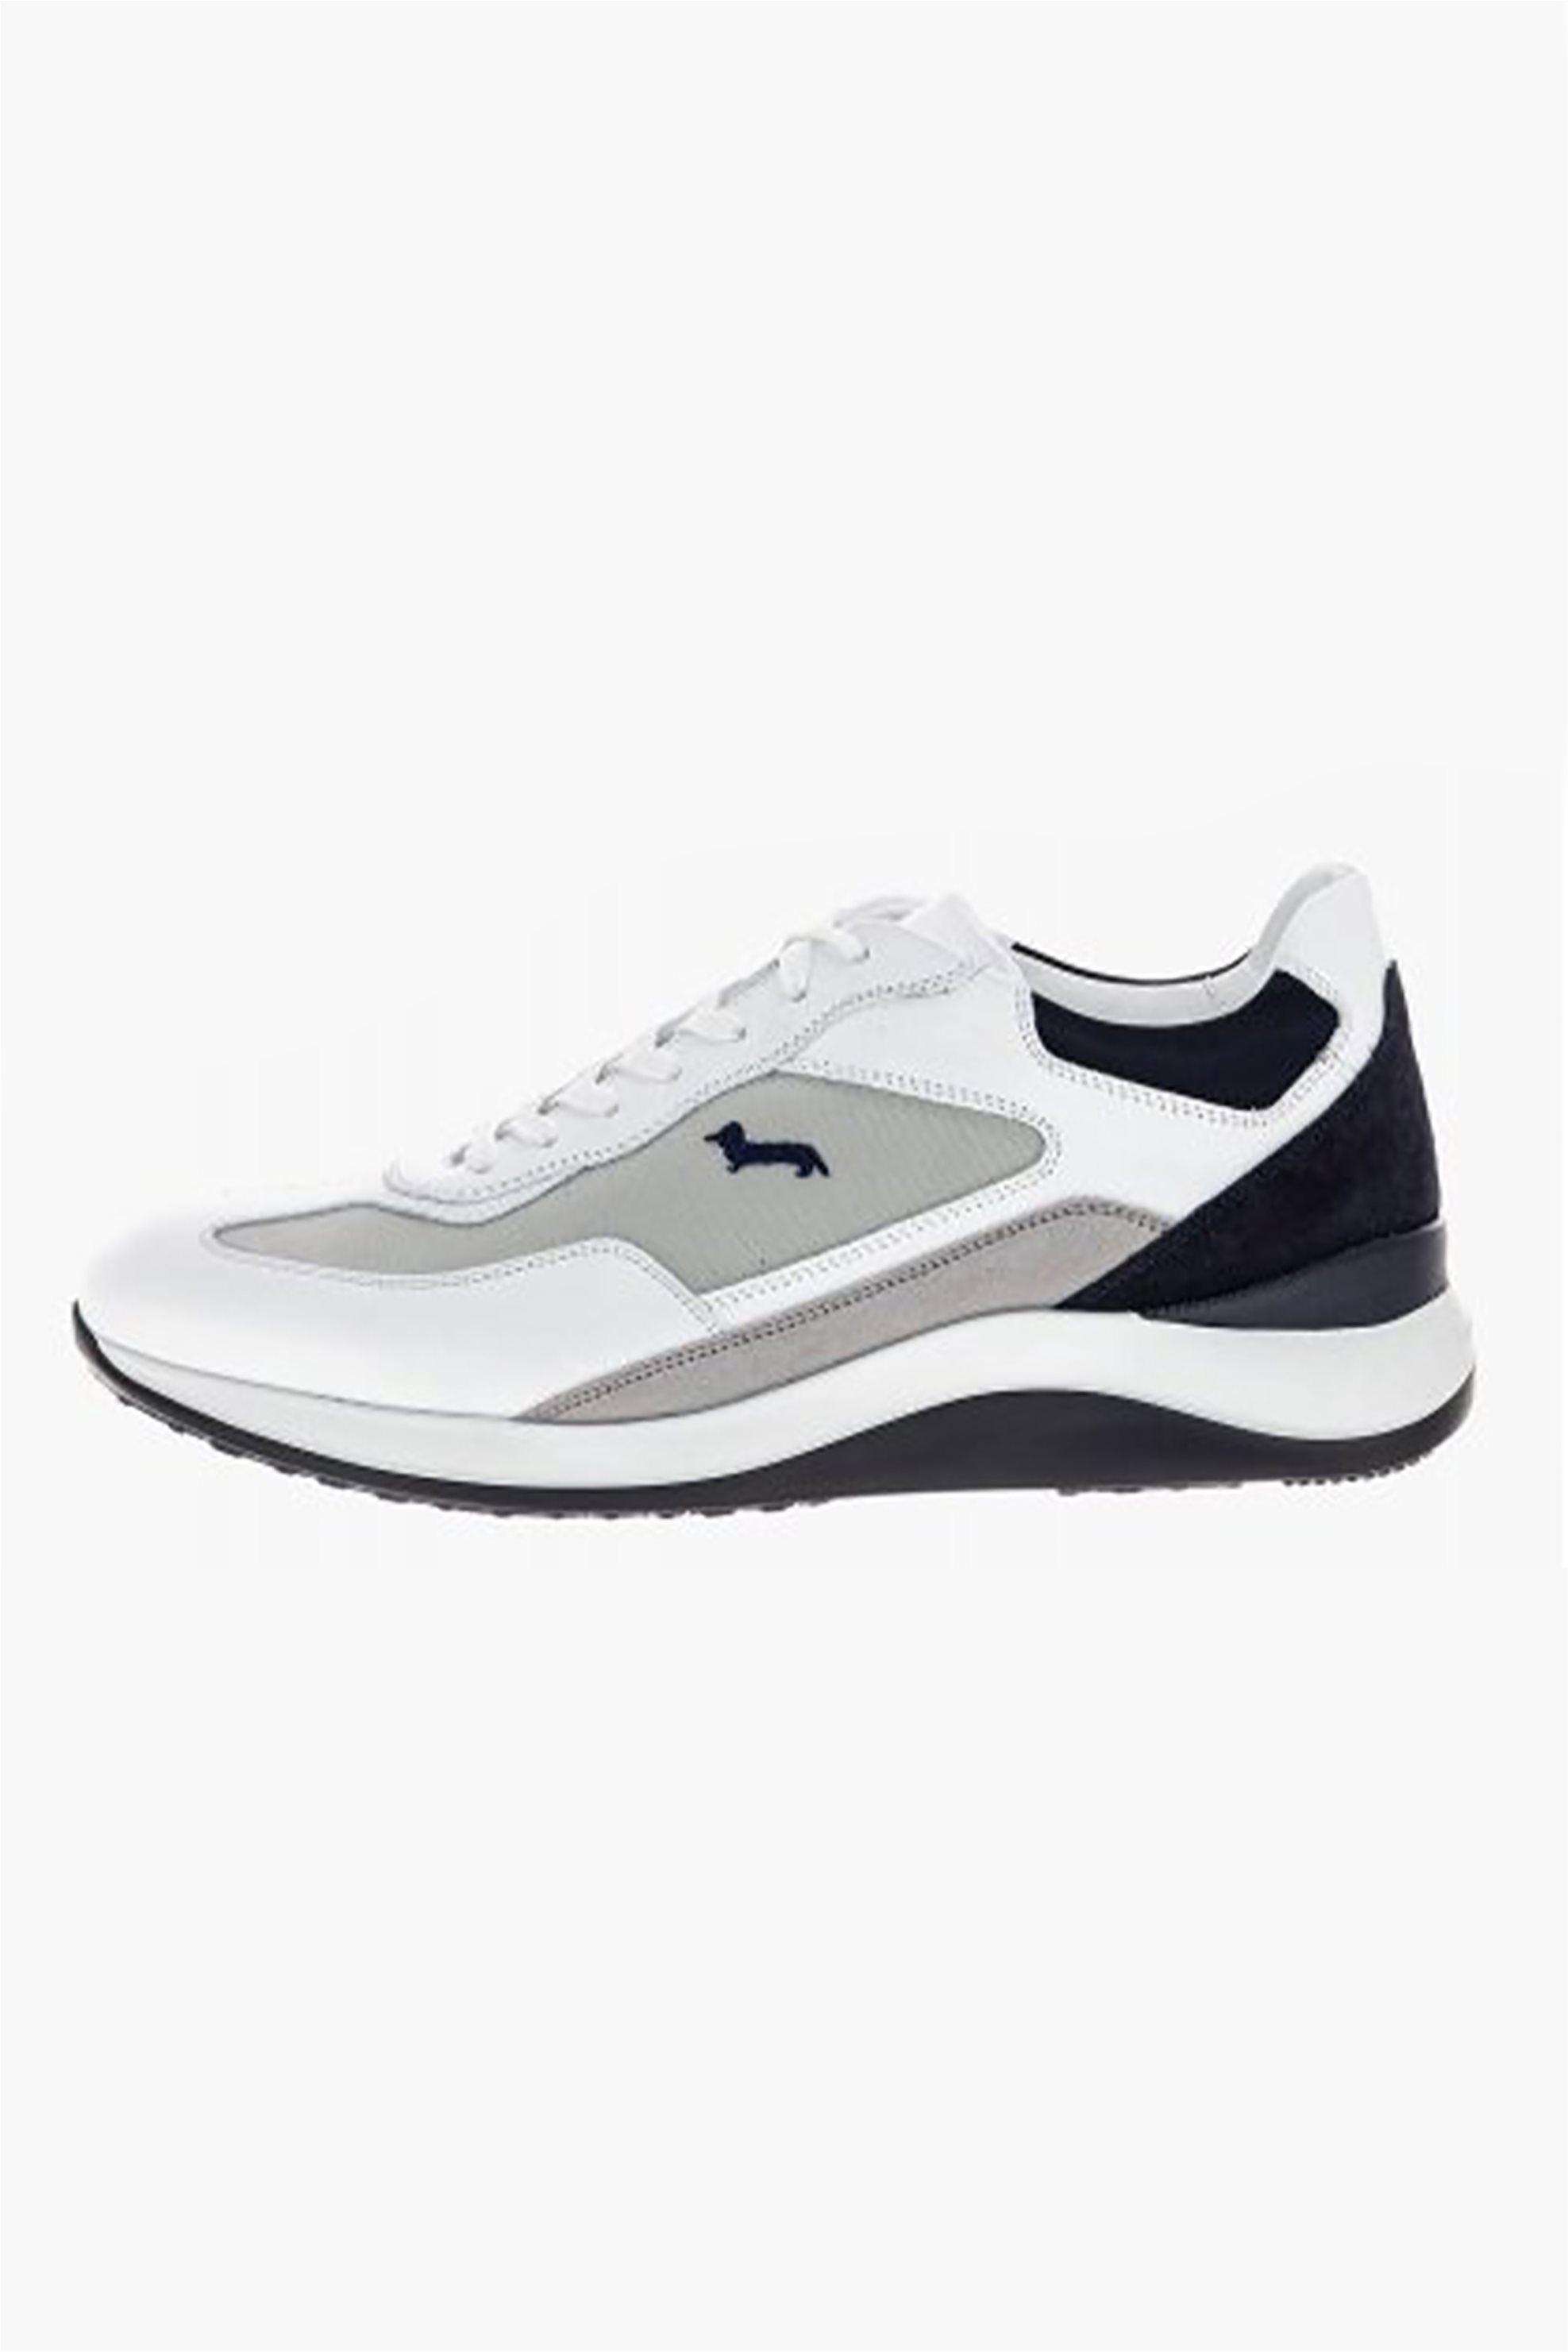 Harmont & Blaine ανδρικά sneakers με suede λεπτομέρειες και κεντημένο logo – EFM201061-6310 – Λευκό